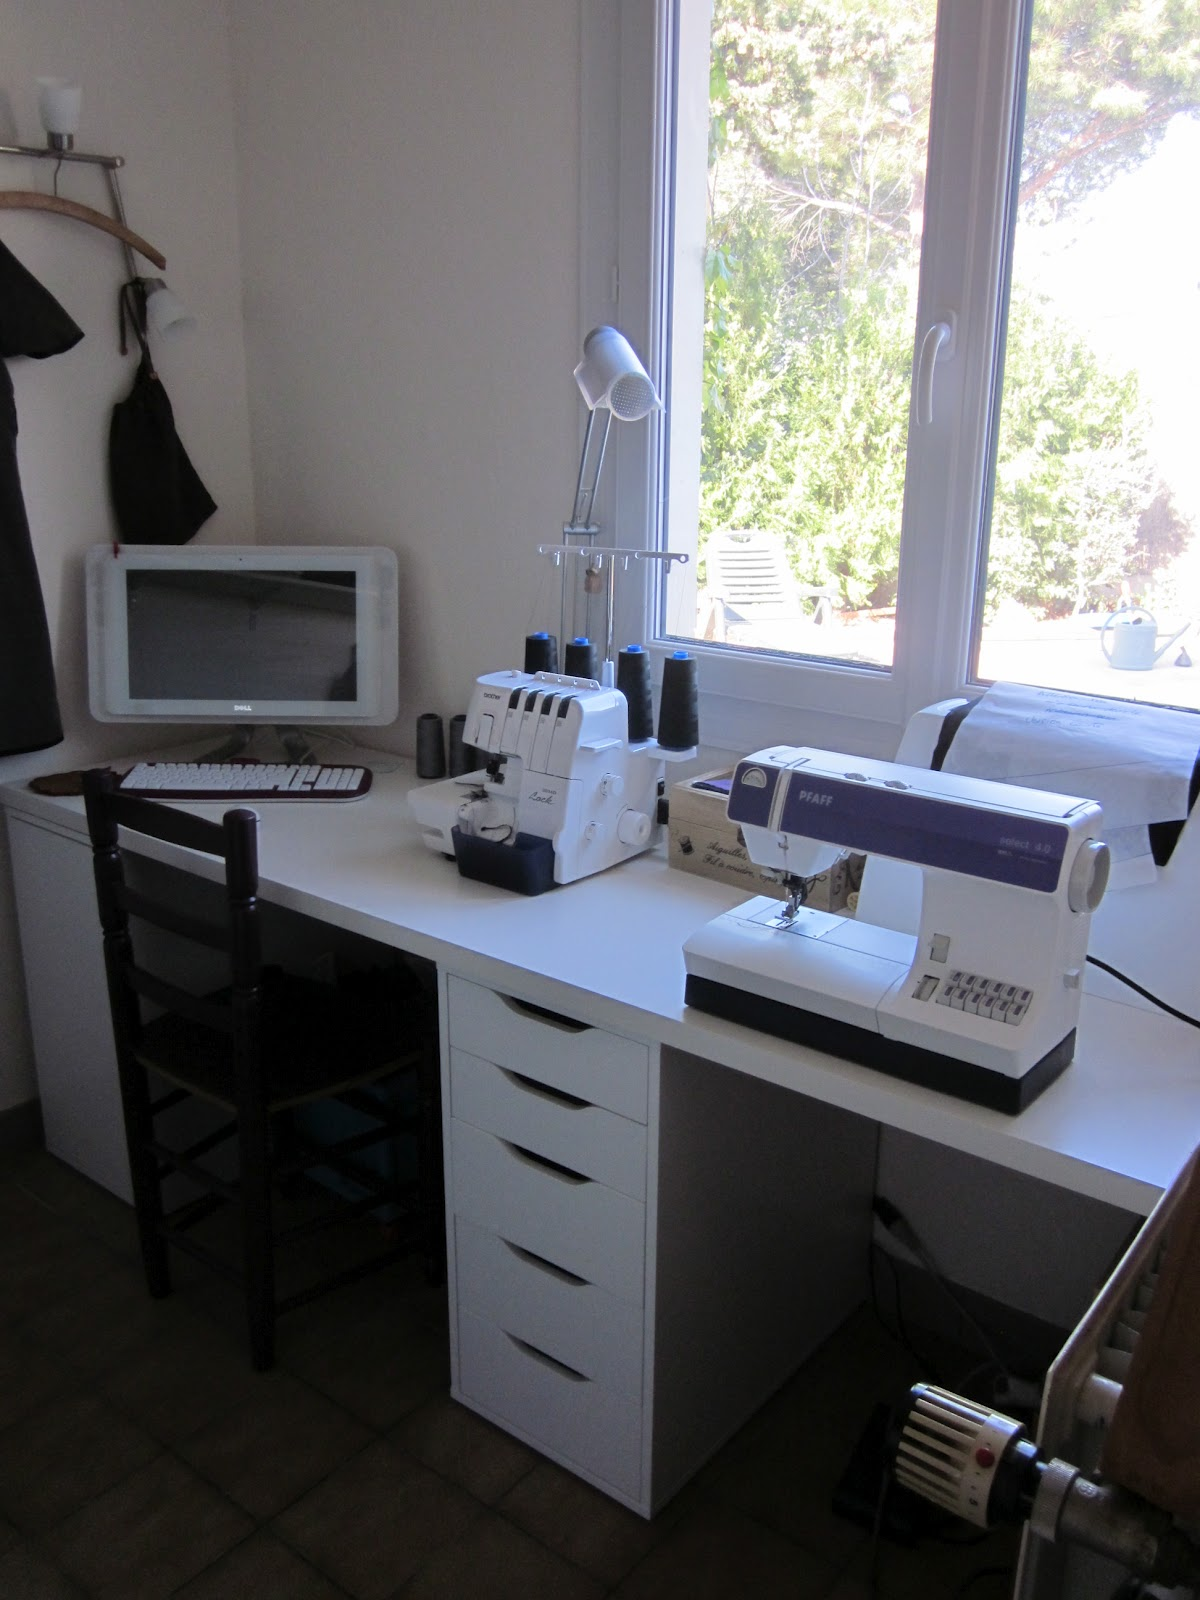 rue des coquelicots atelier couture. Black Bedroom Furniture Sets. Home Design Ideas